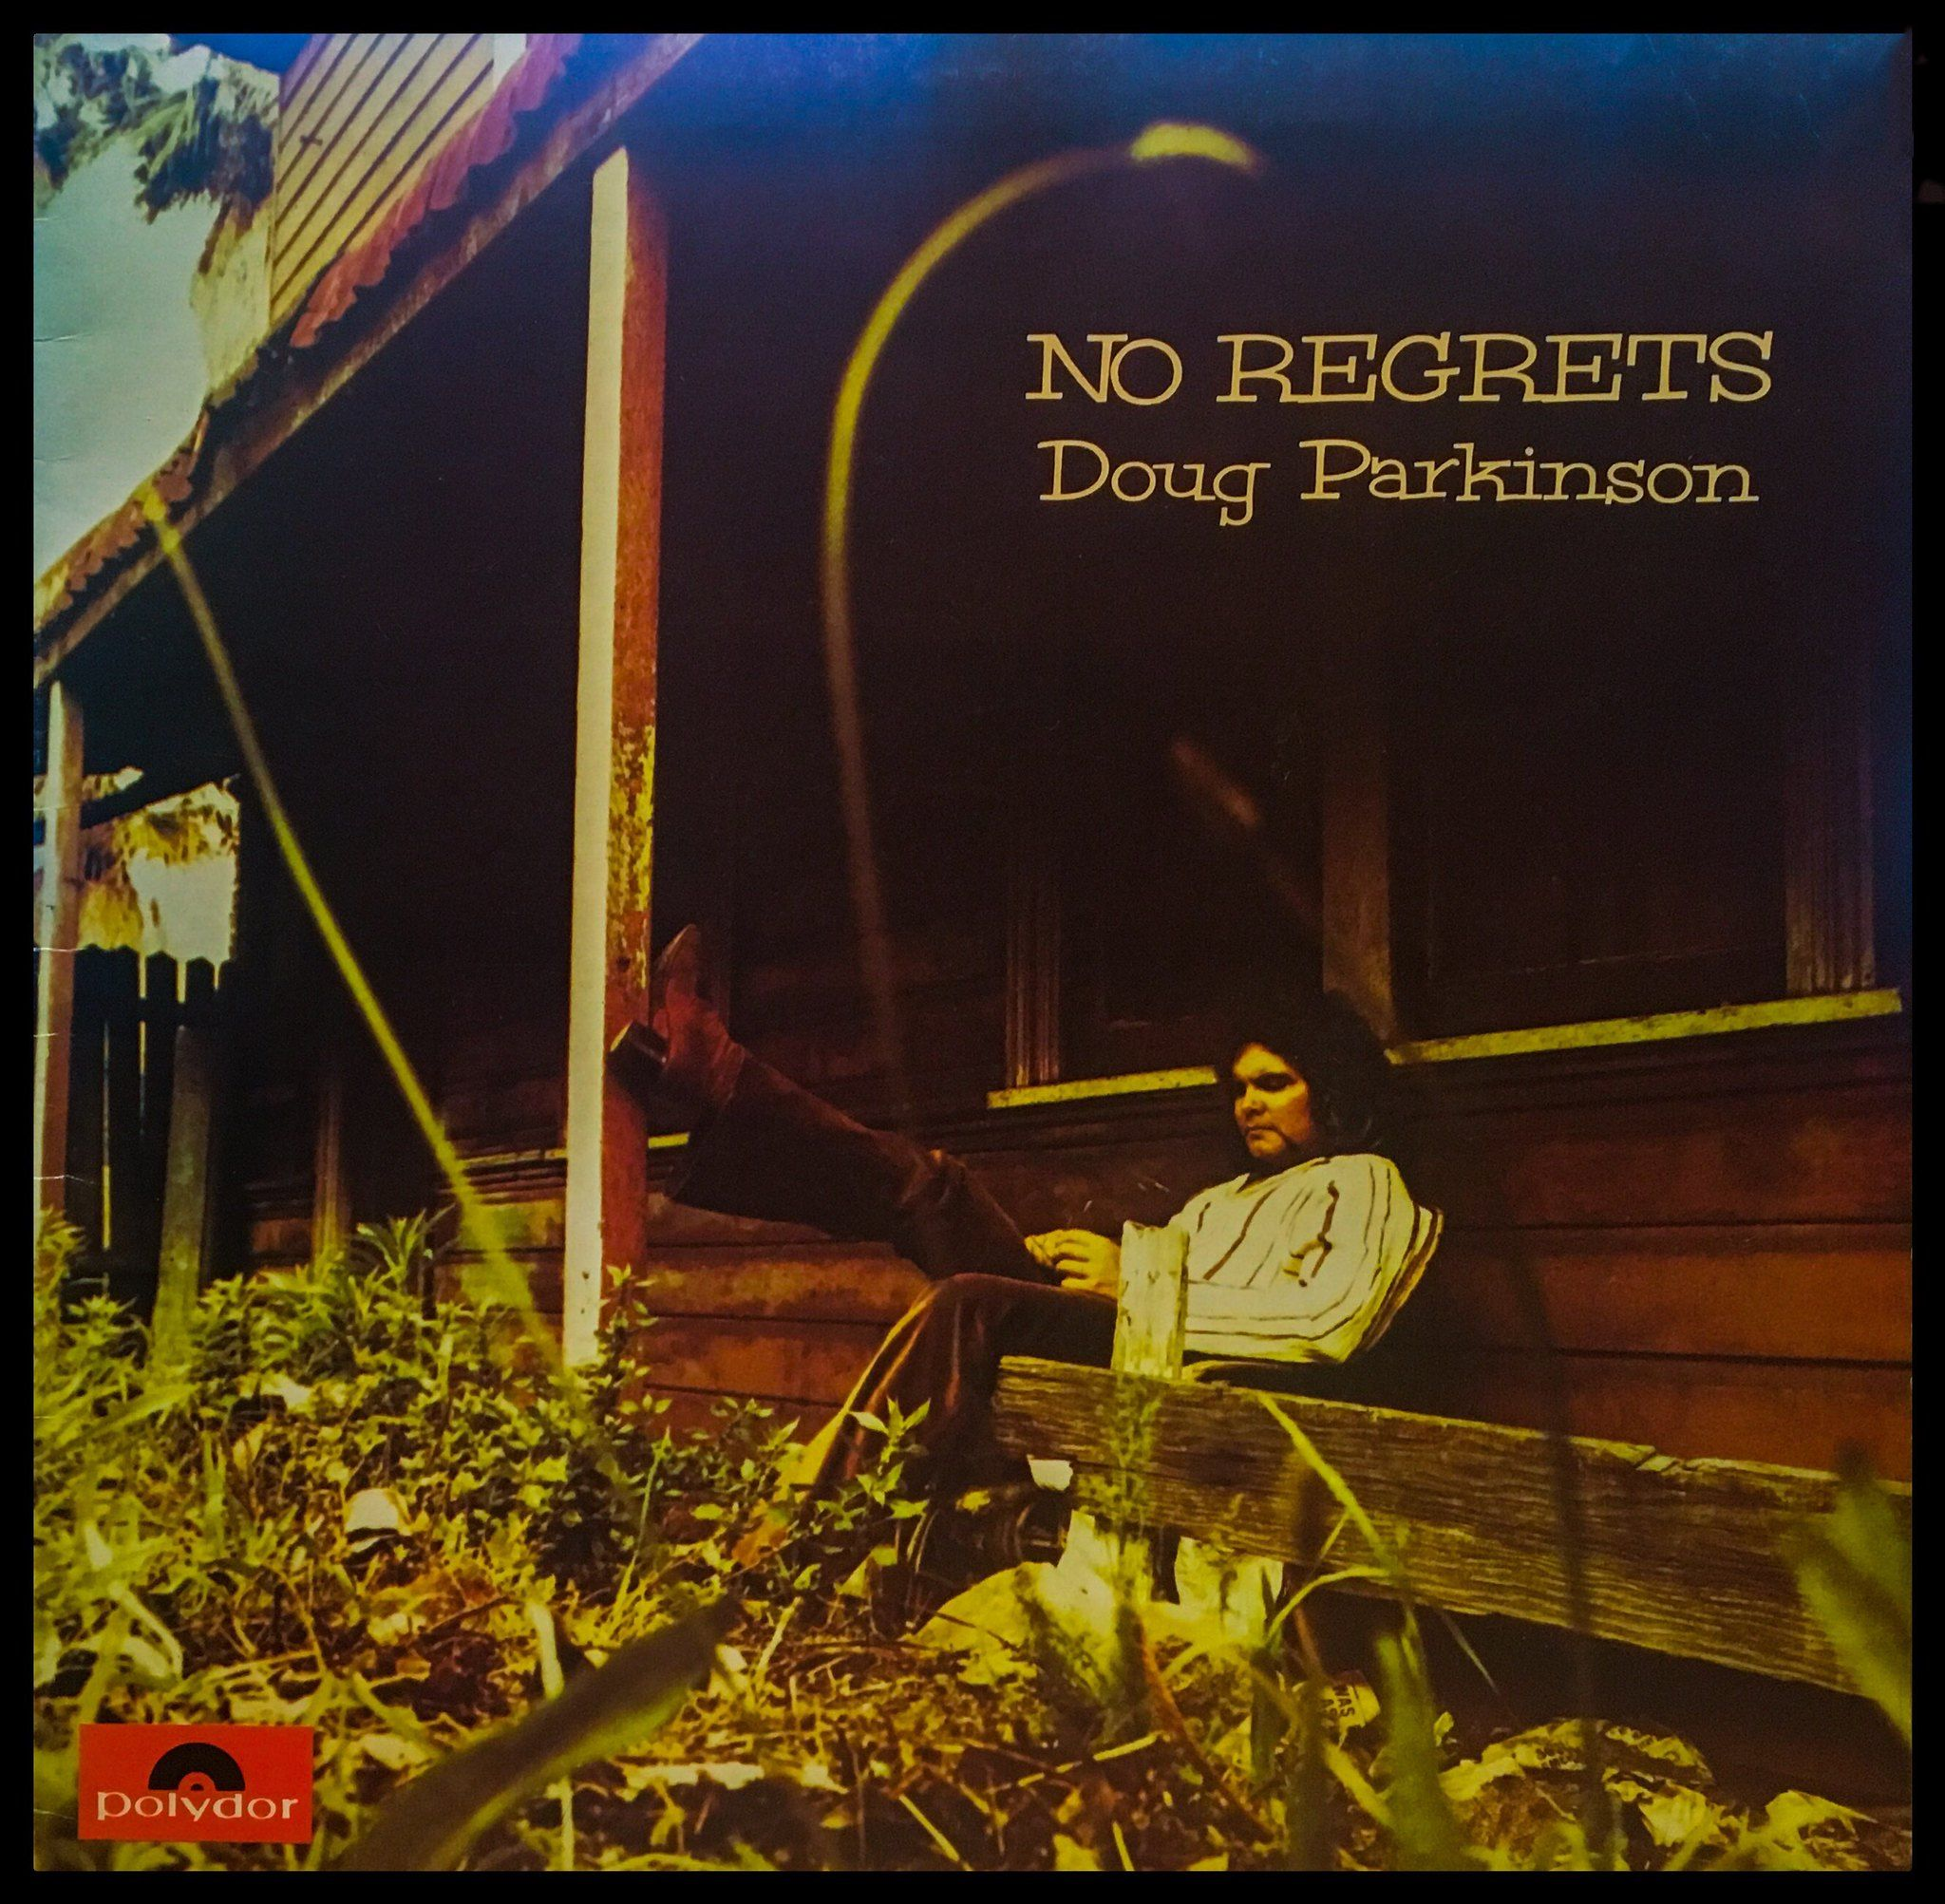 Doug parkinson no regretslp parkinsons regrets songs